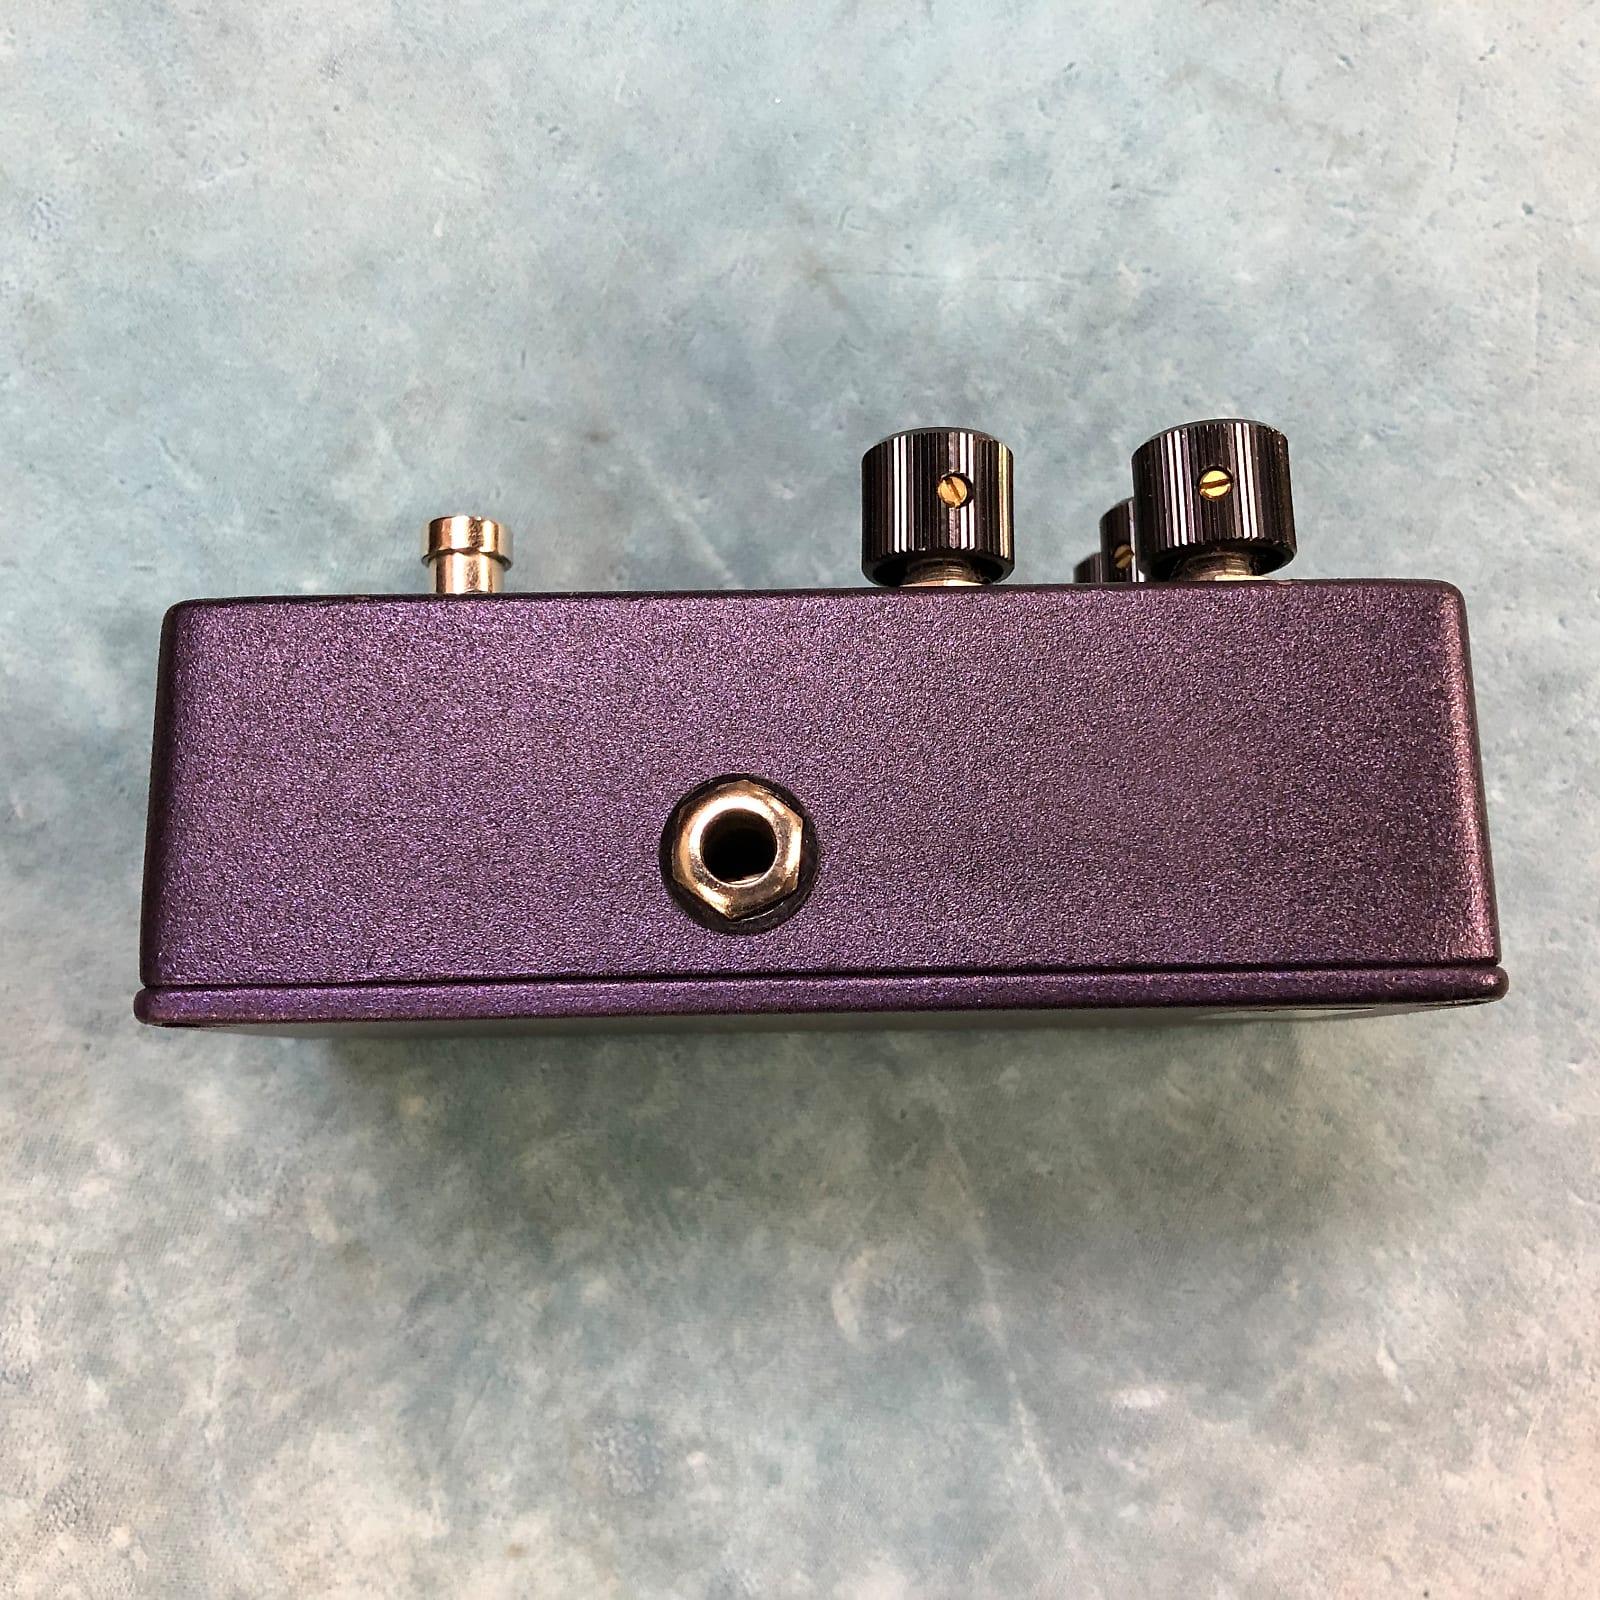 Walrus Audio Julia V1 Chorus / Vibrato Effects Pedal w/ Box